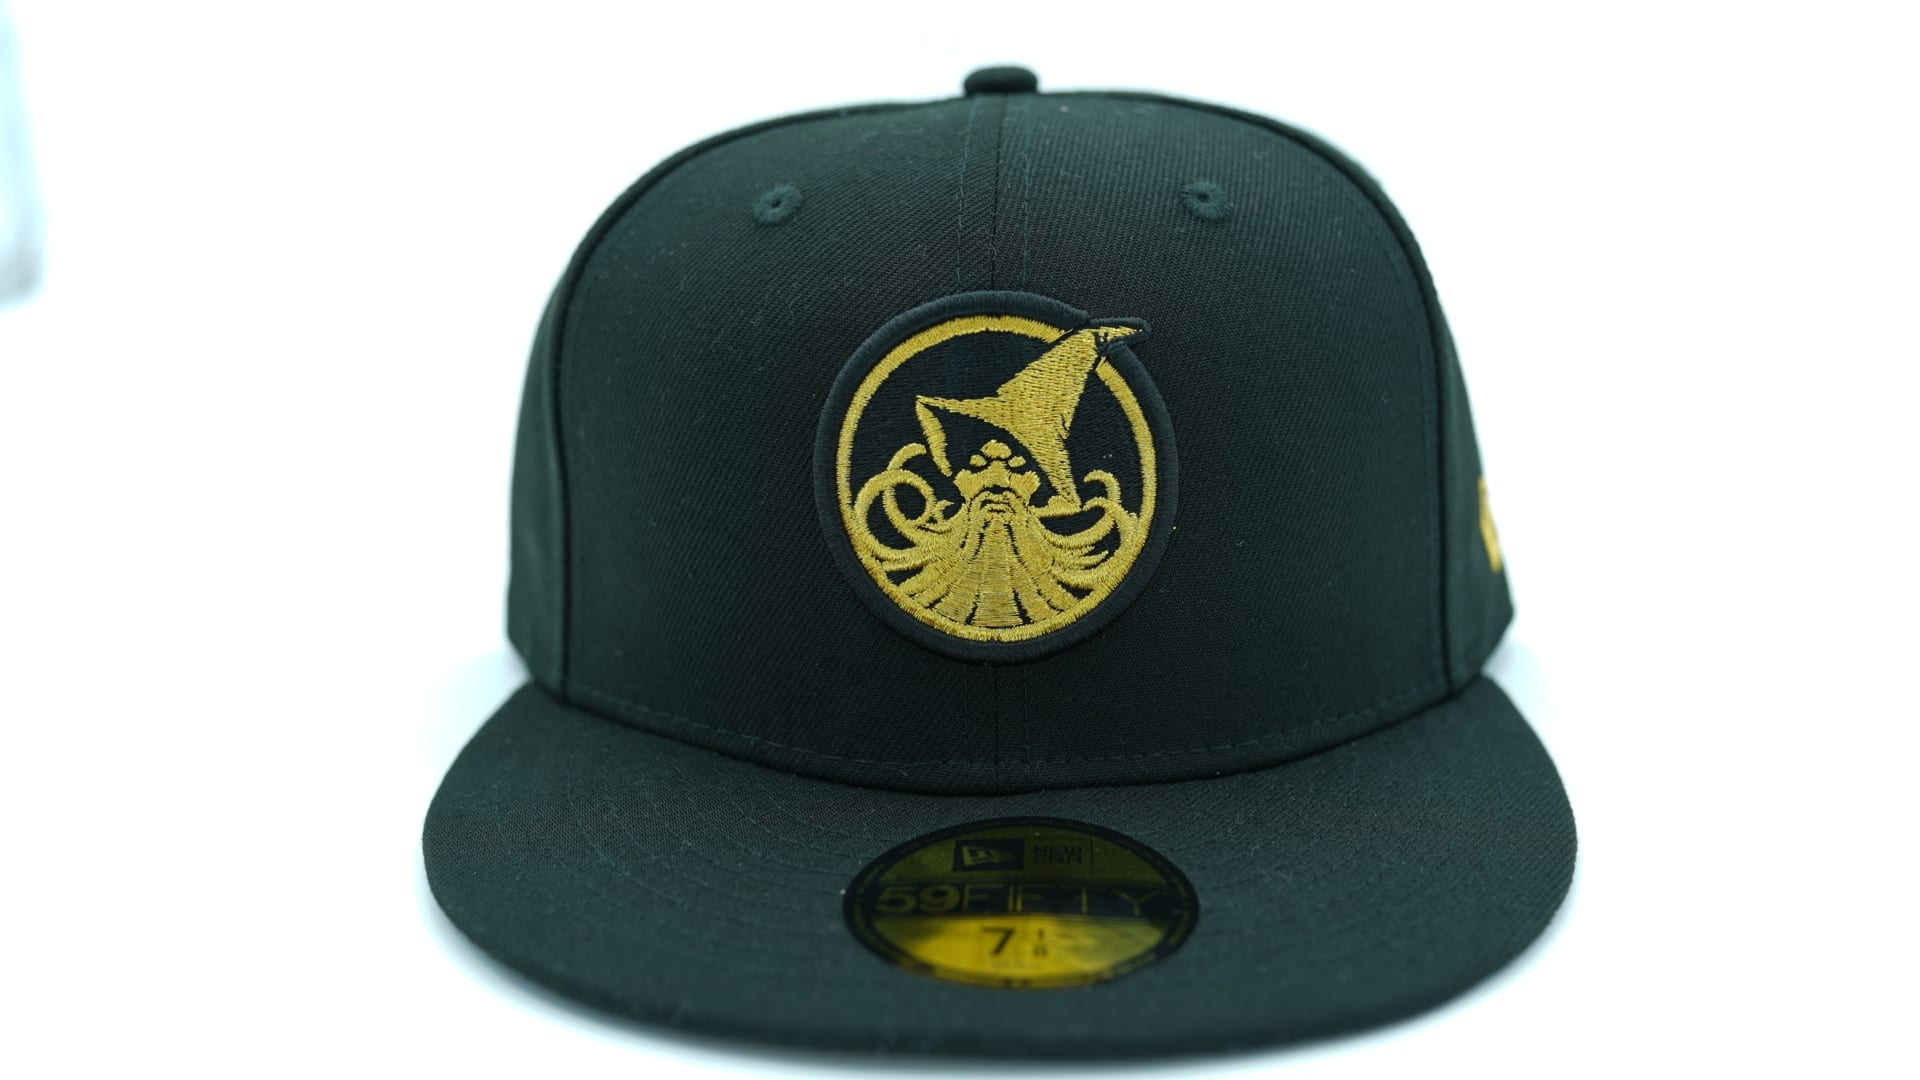 7893d50b3f275 baltimore black sox team classical 59fifty fitted baseball cap new era  negro league